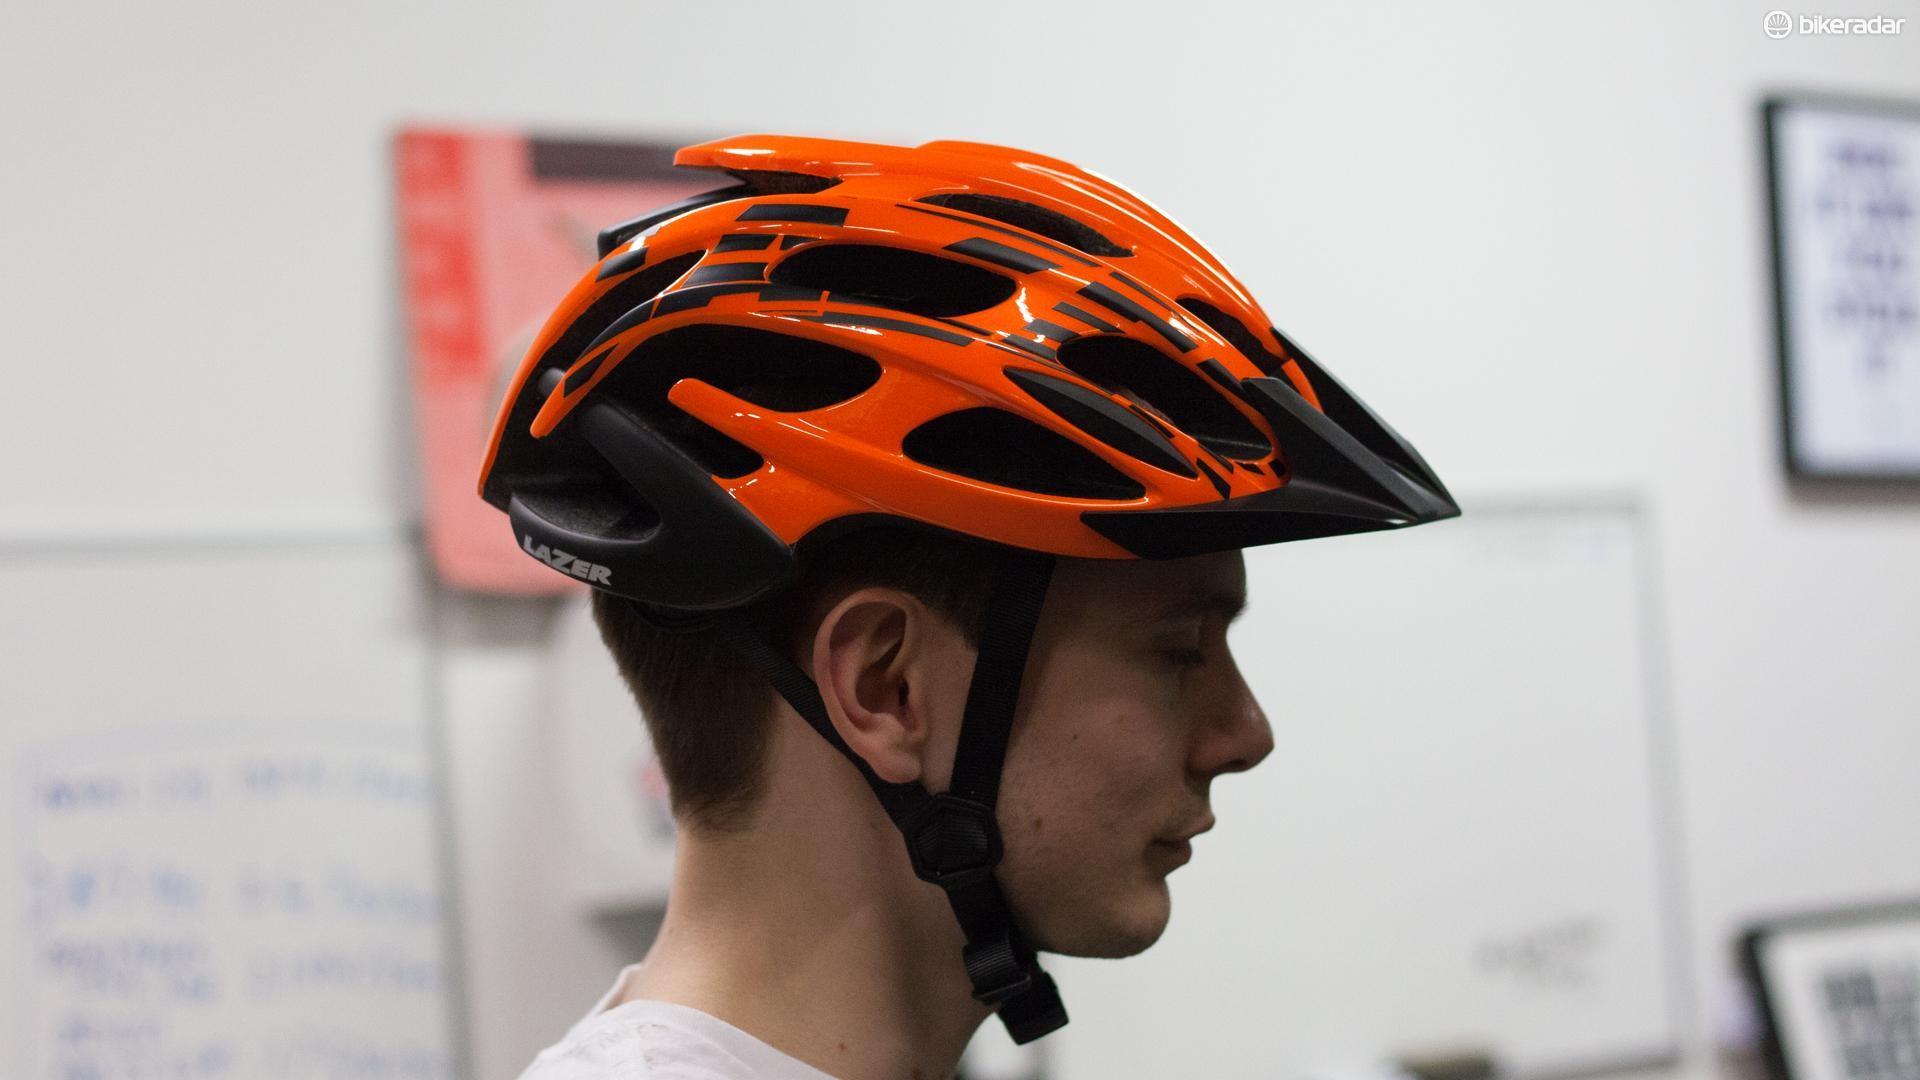 Lazer Magma helmet